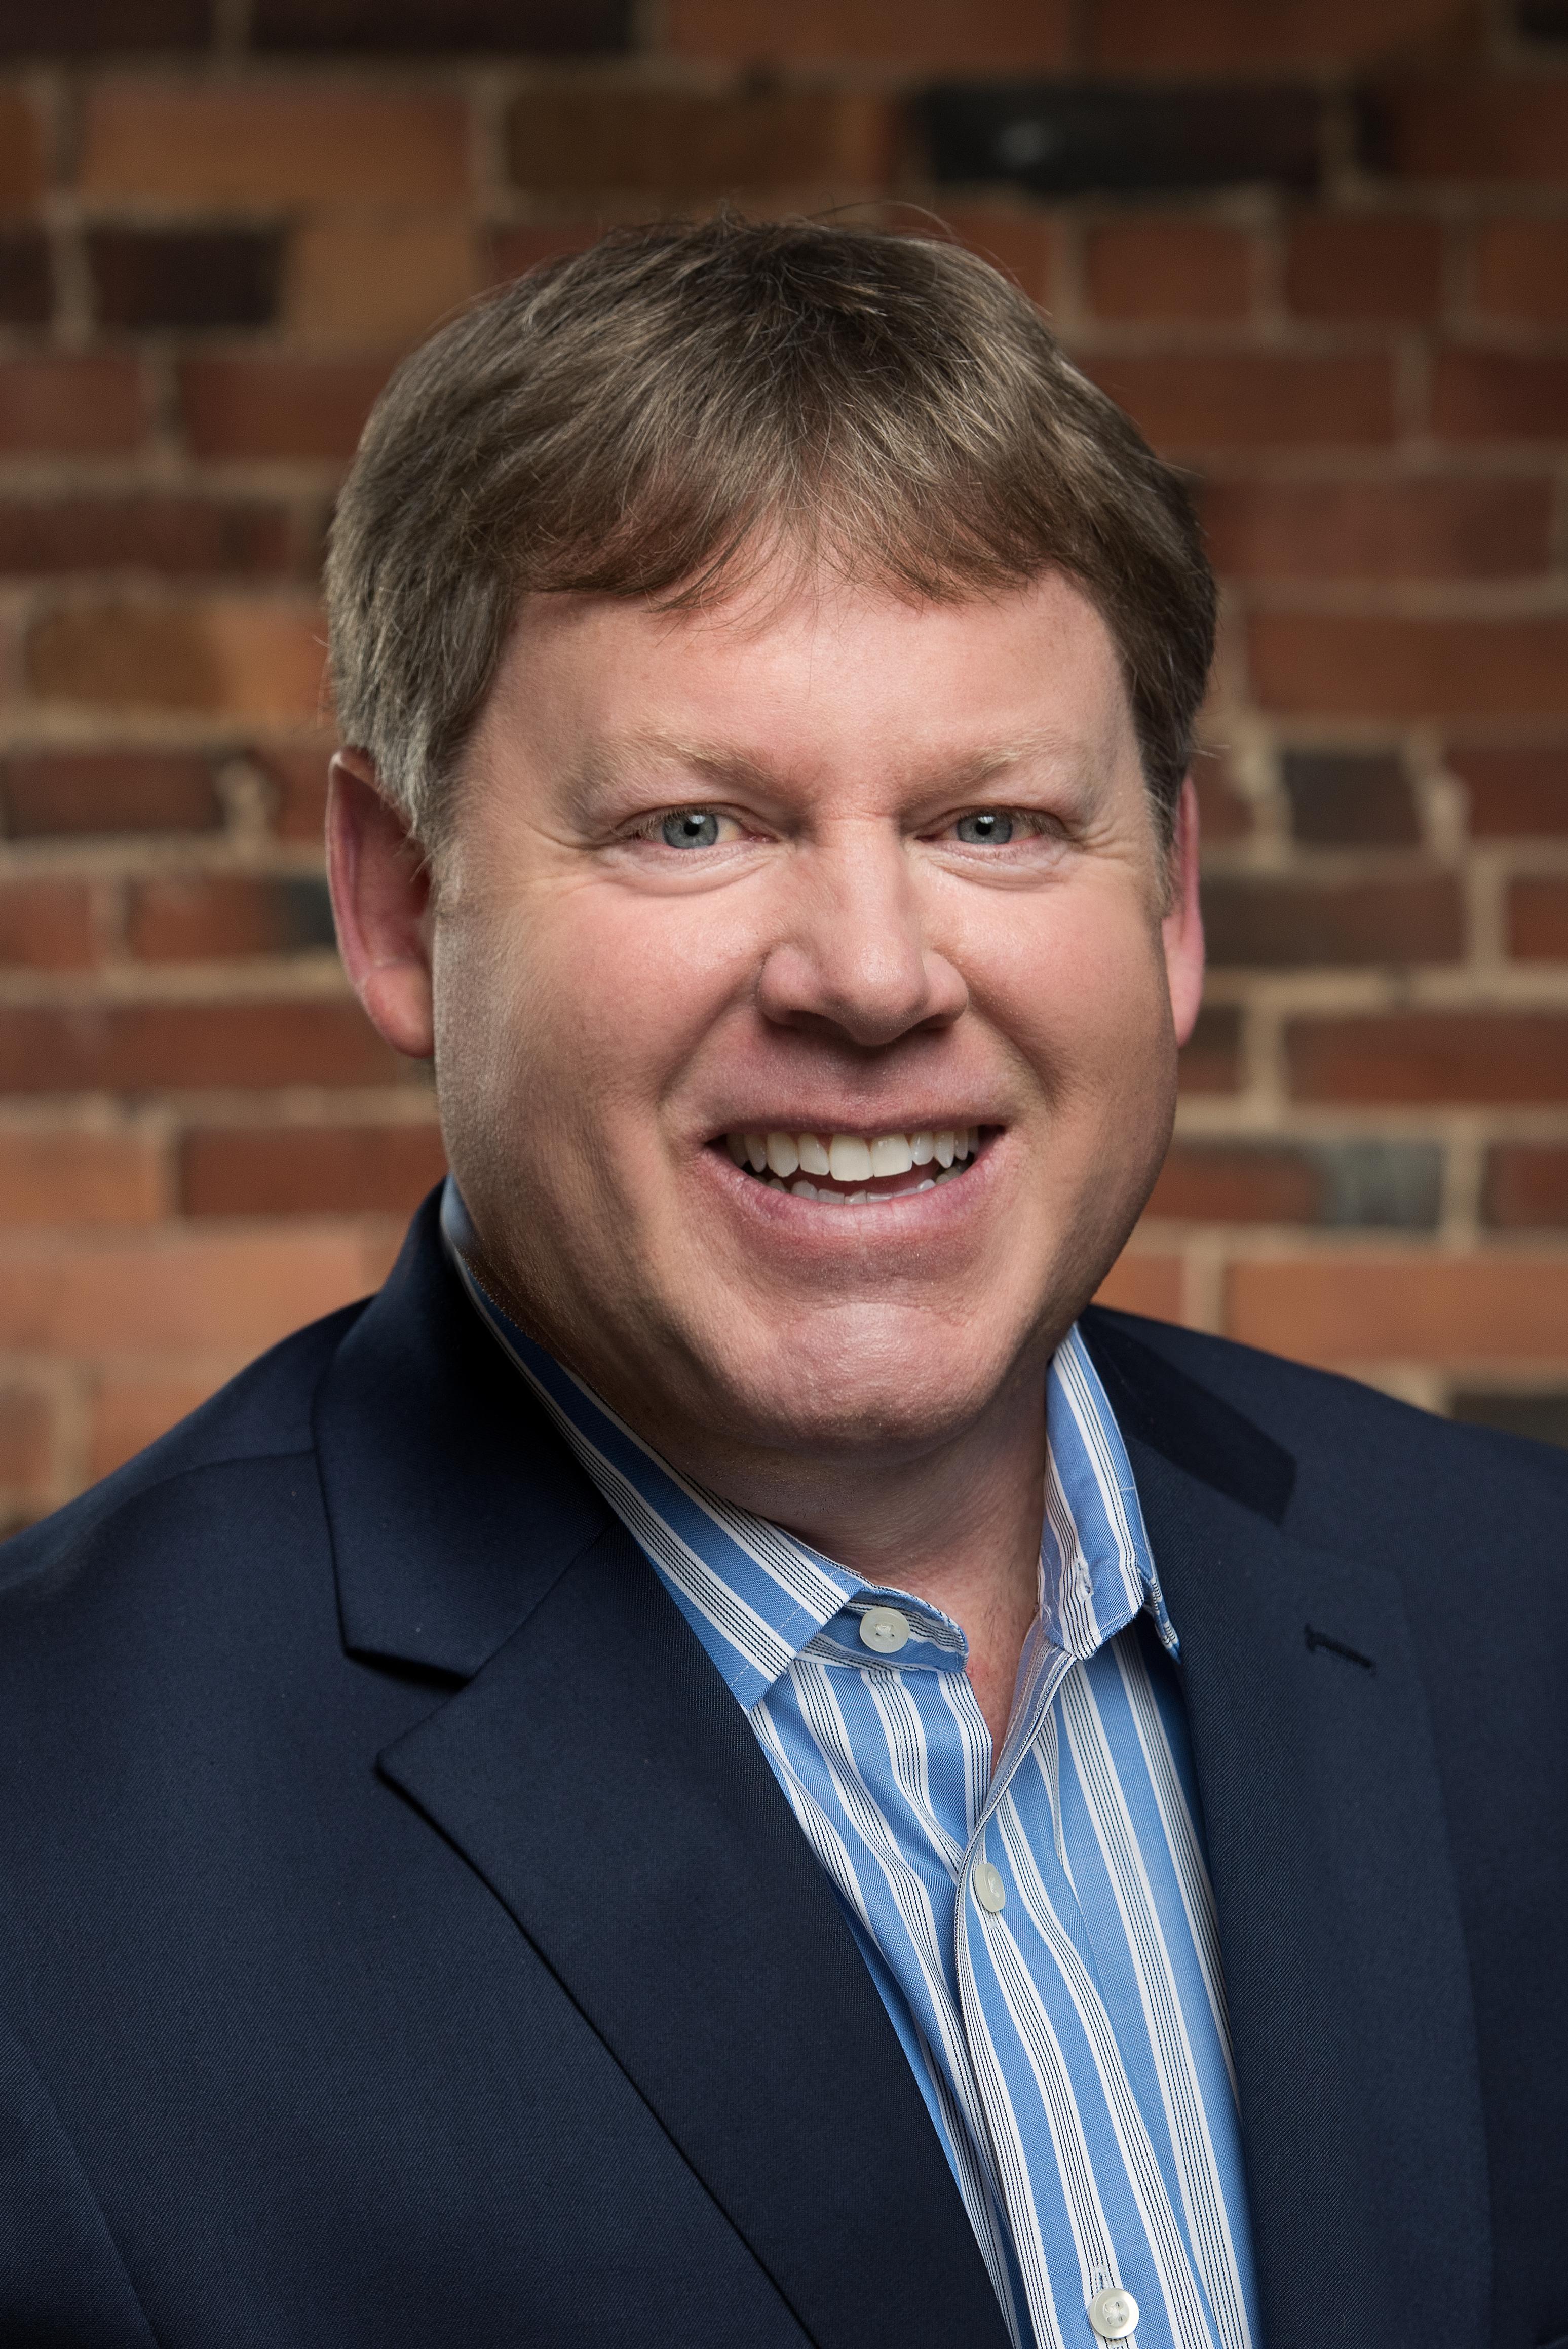 Mike Hammond, Hammond Lumber Co. President/CEO